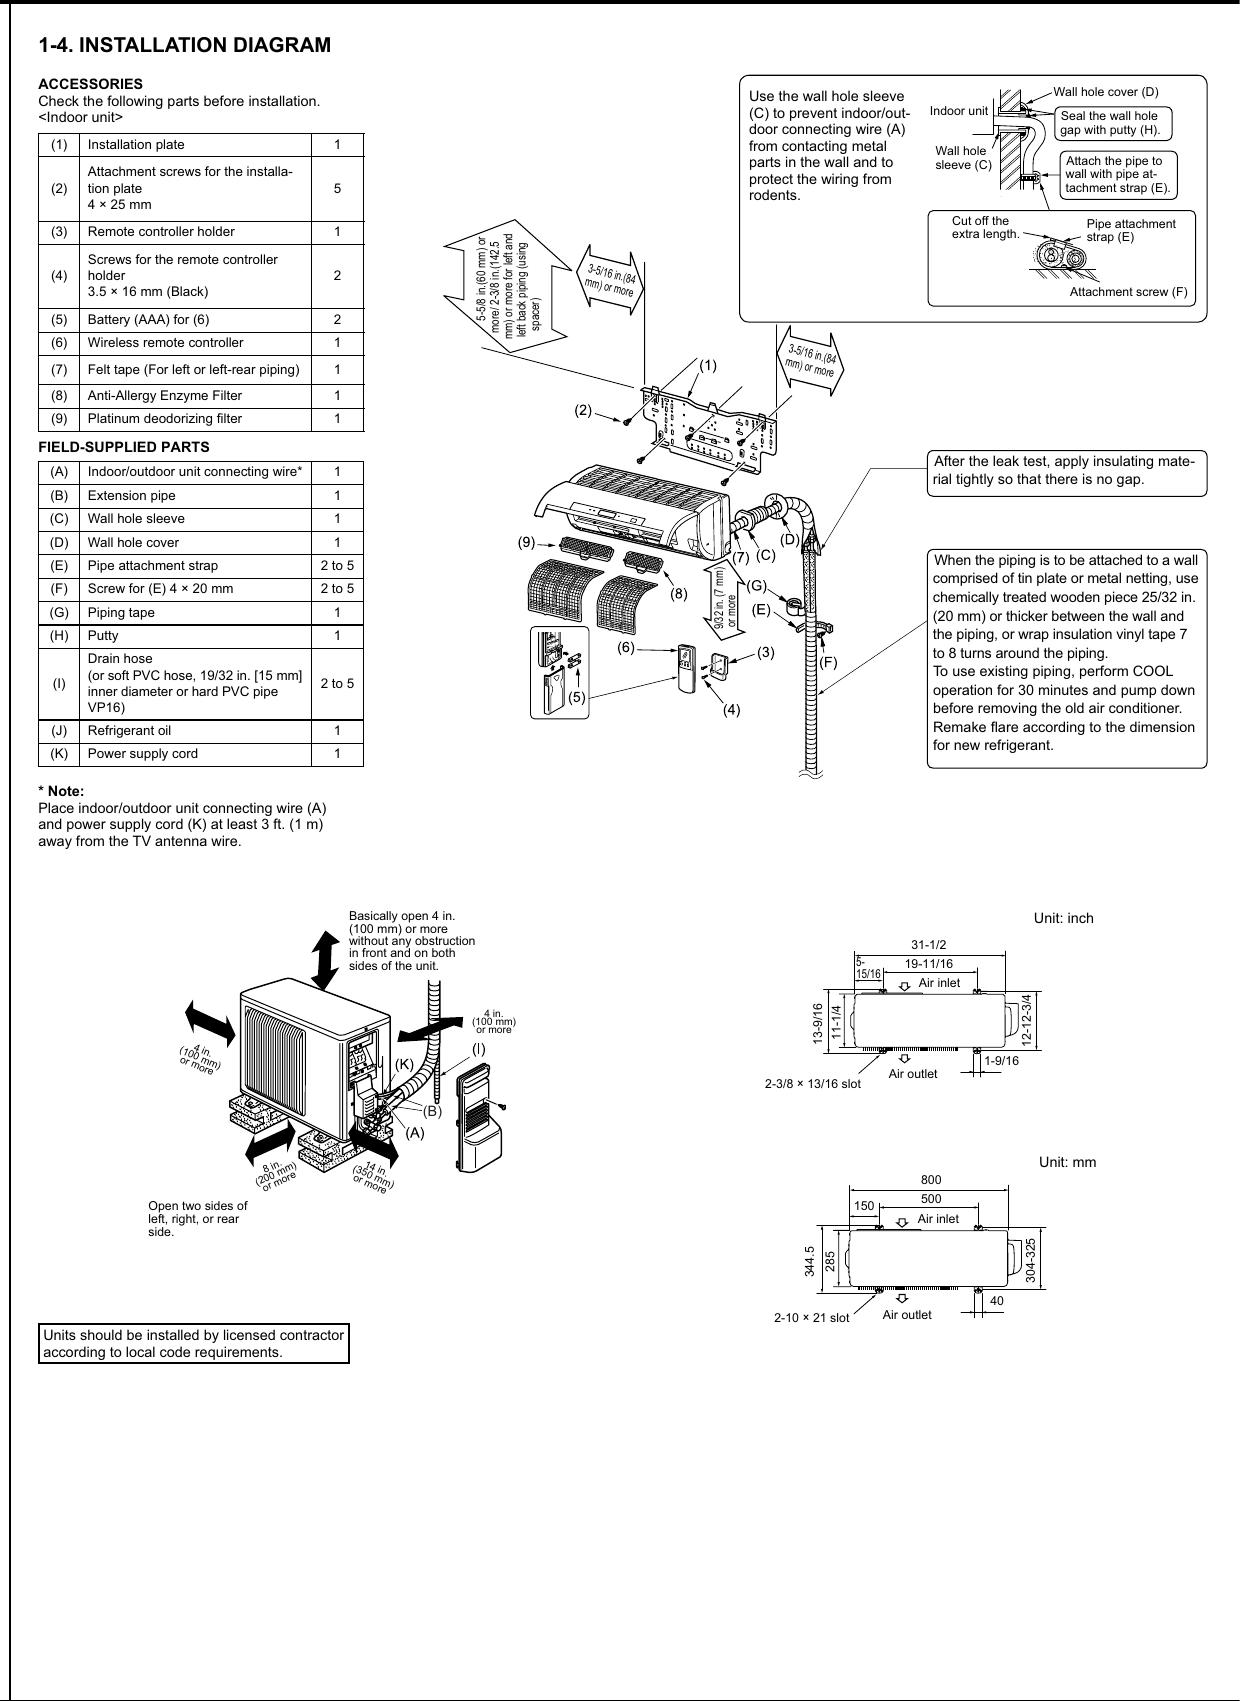 Mitsubishi Electronics Msz Fd09 12na Users Manual Jg79a015h01 En Wiring Diagram Page 3 Of 8